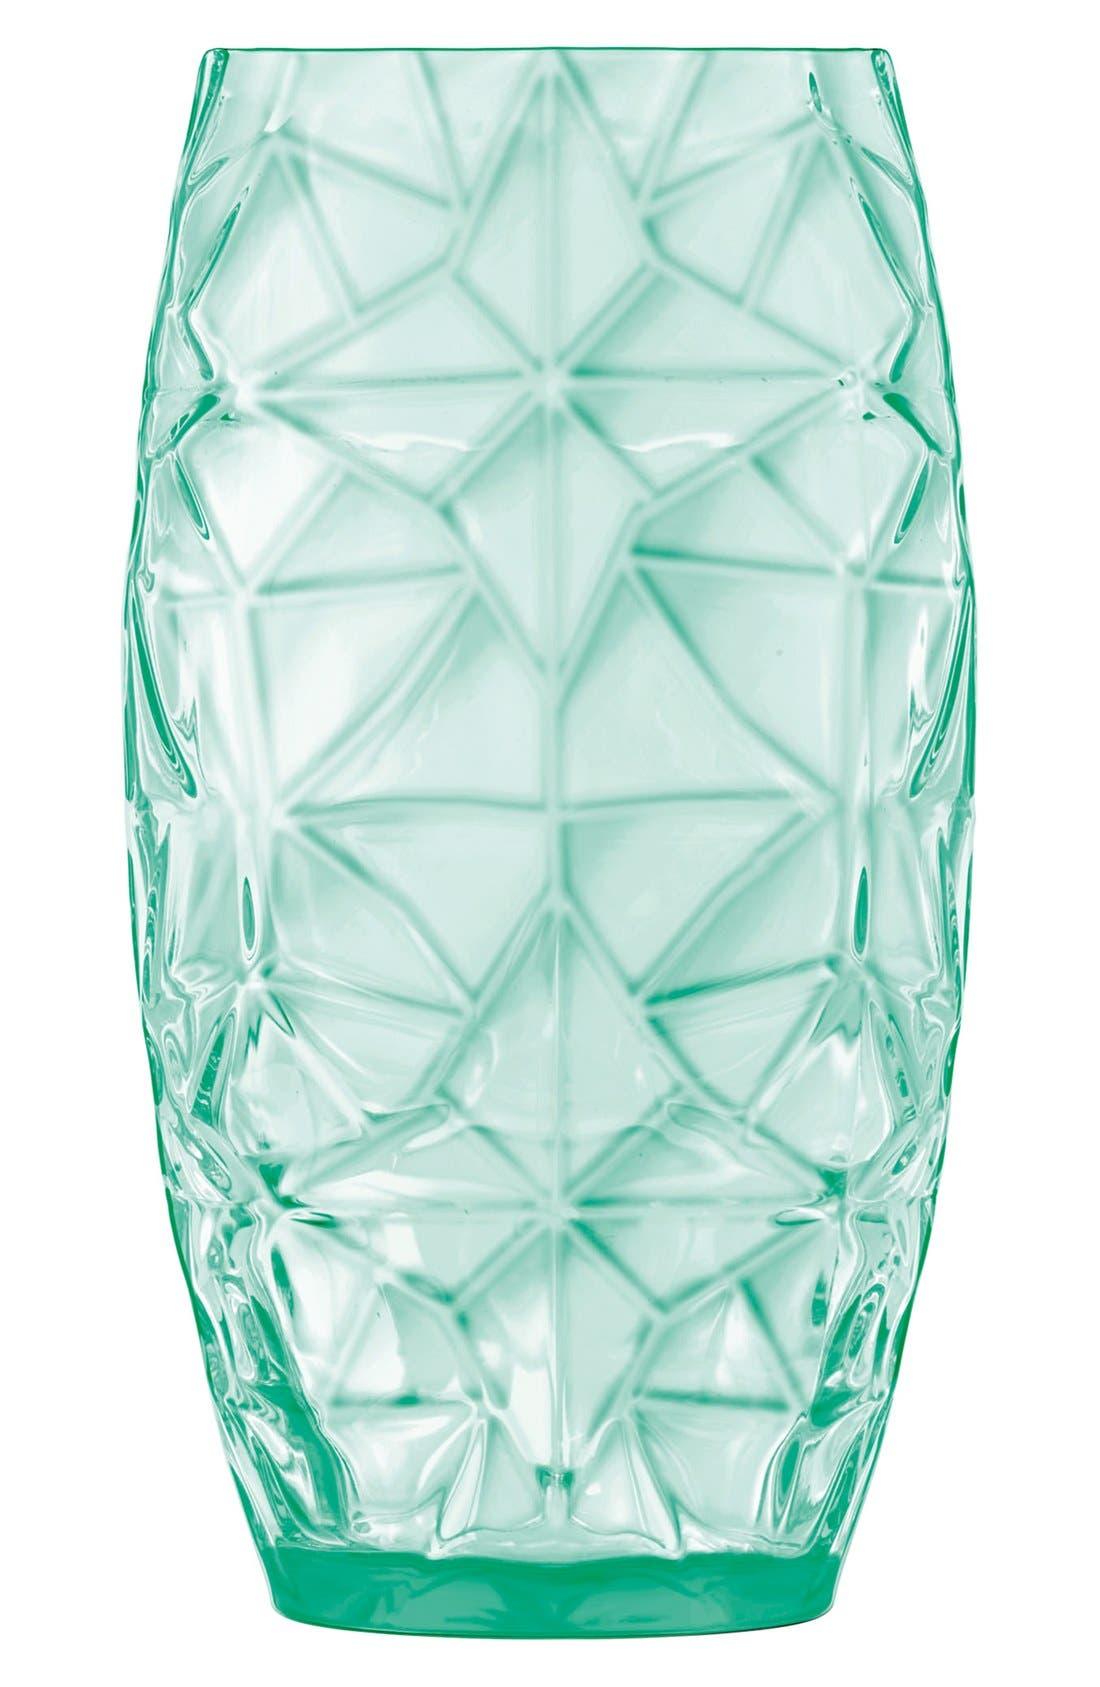 Alternate Image 1 Selected - Luigi Bormioli 'Prezioso' Beverage Glasses (Set of 4)